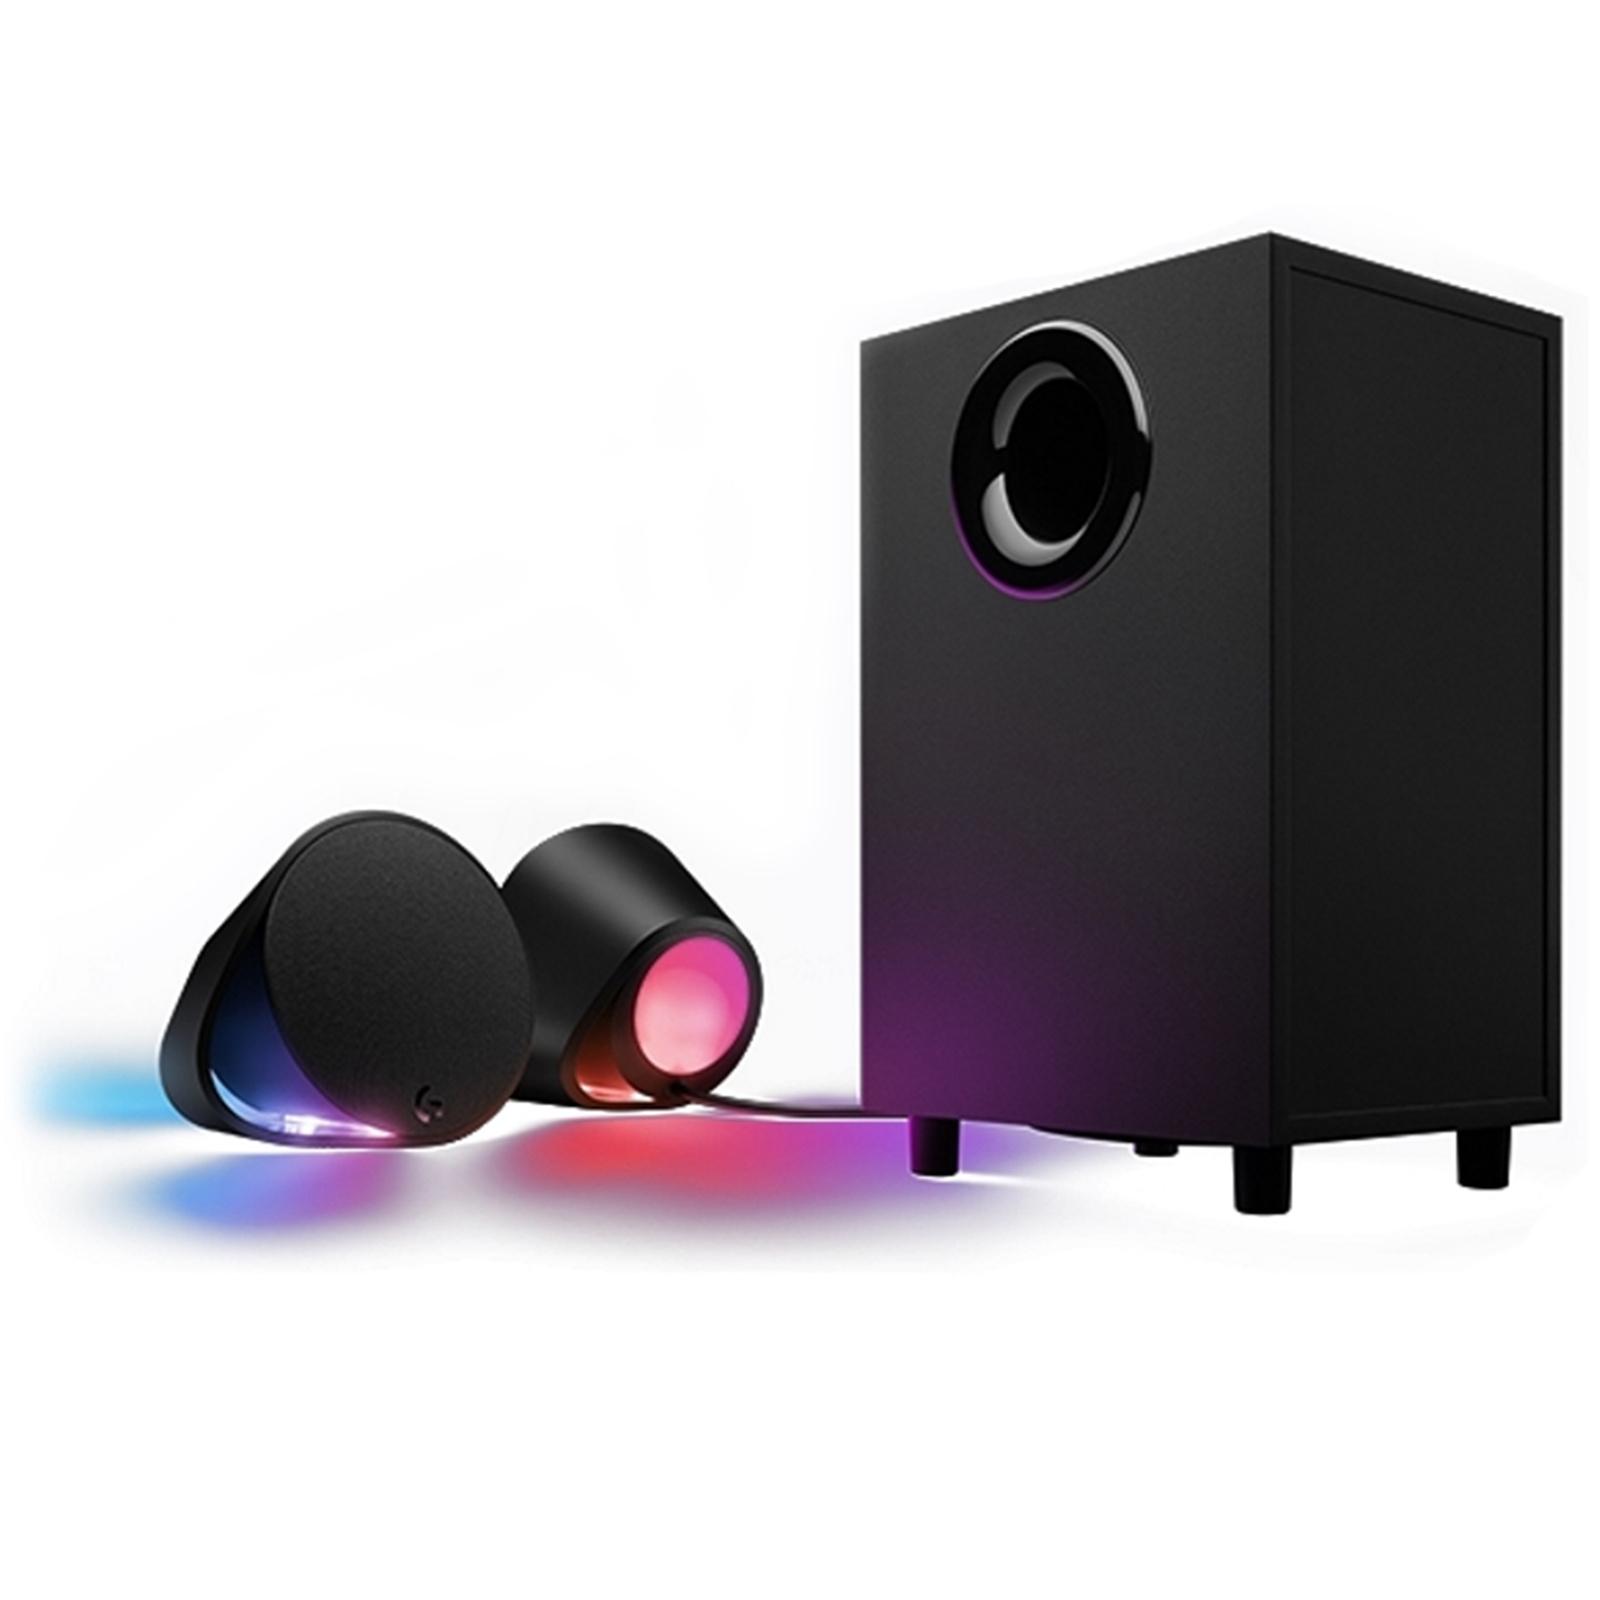 Buy the Logitech G560 2 1 LIGHTSYNC PC RGB Gaming Speaker, Game